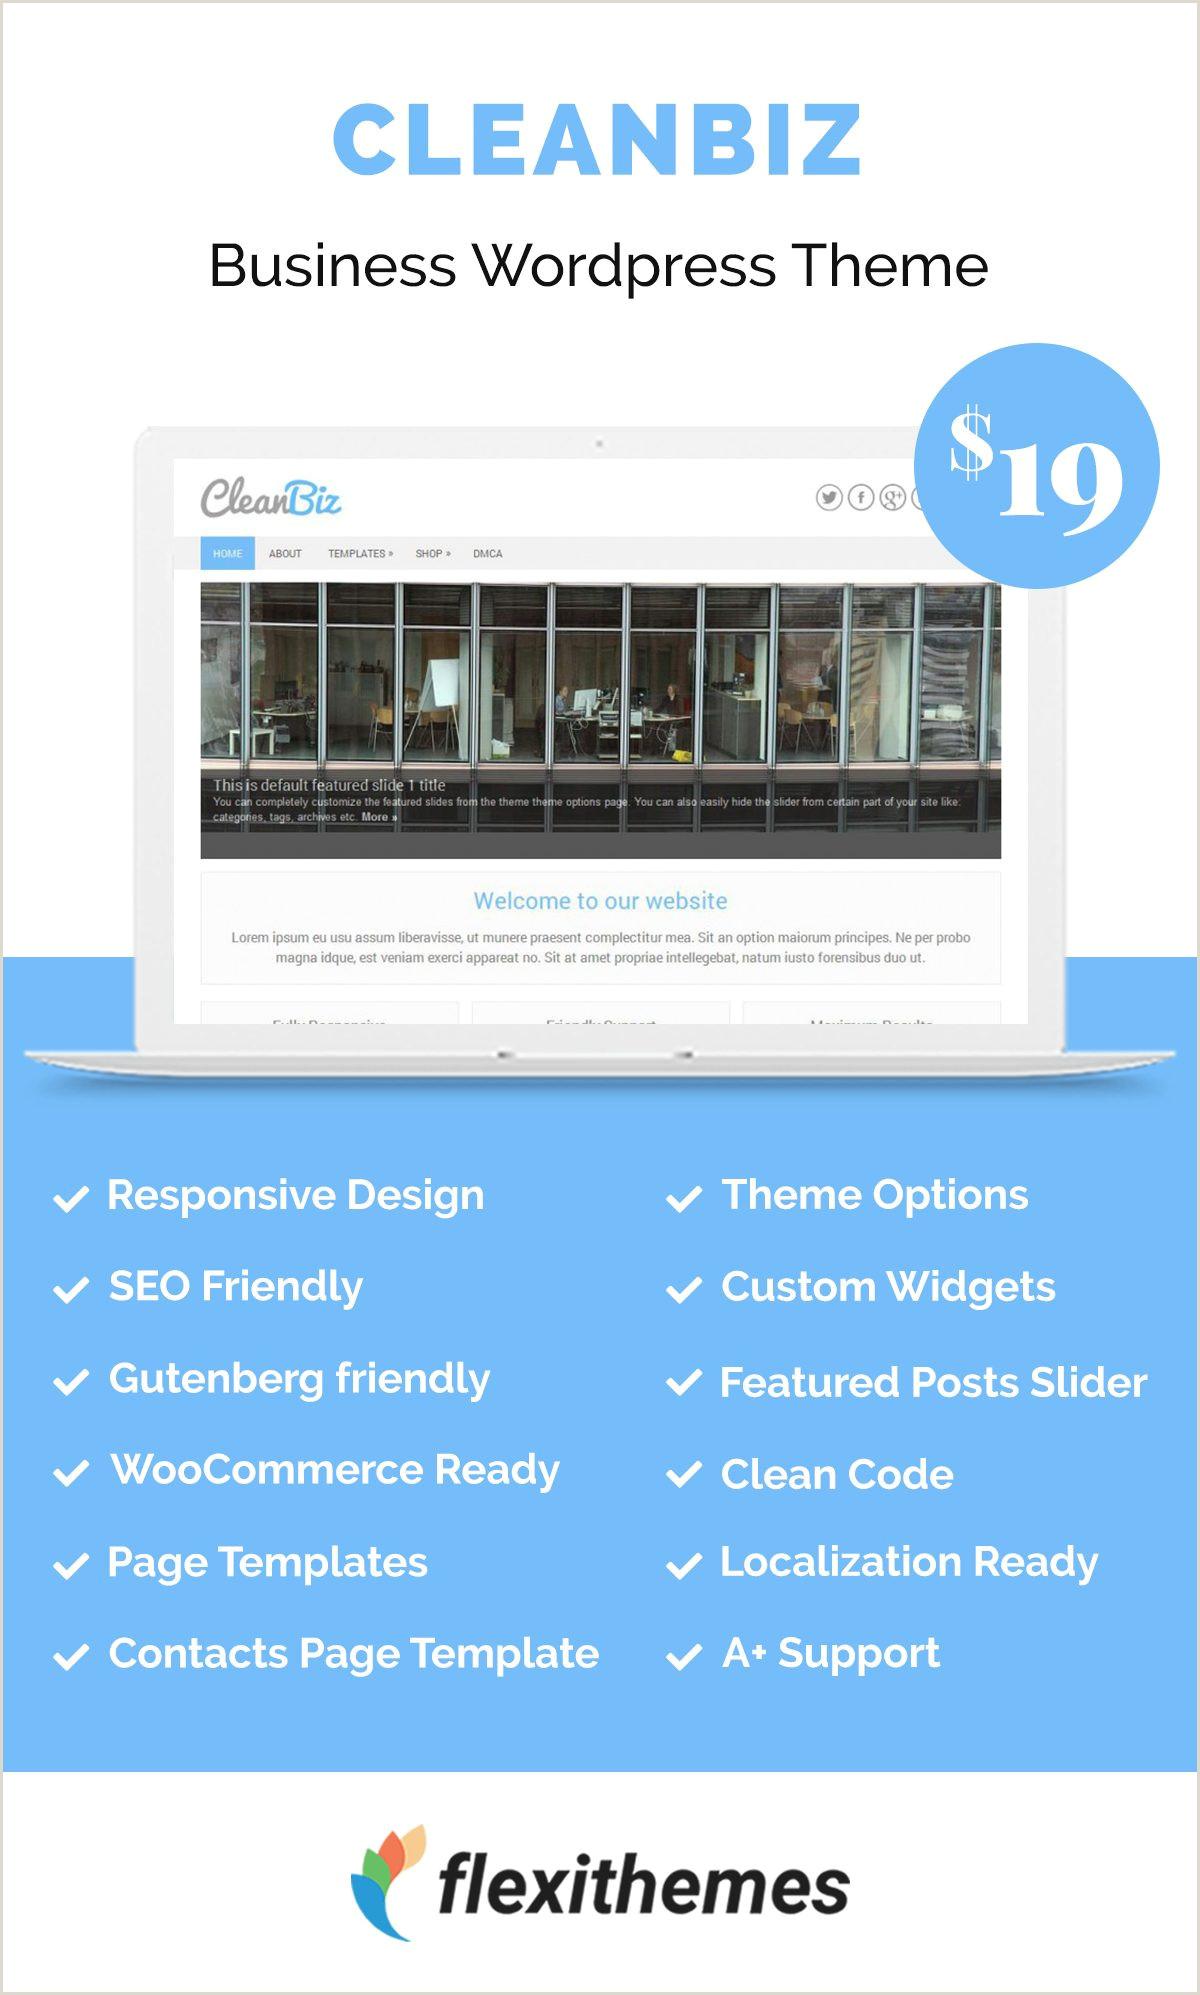 Biz Cards Online WordPress Template Service Business